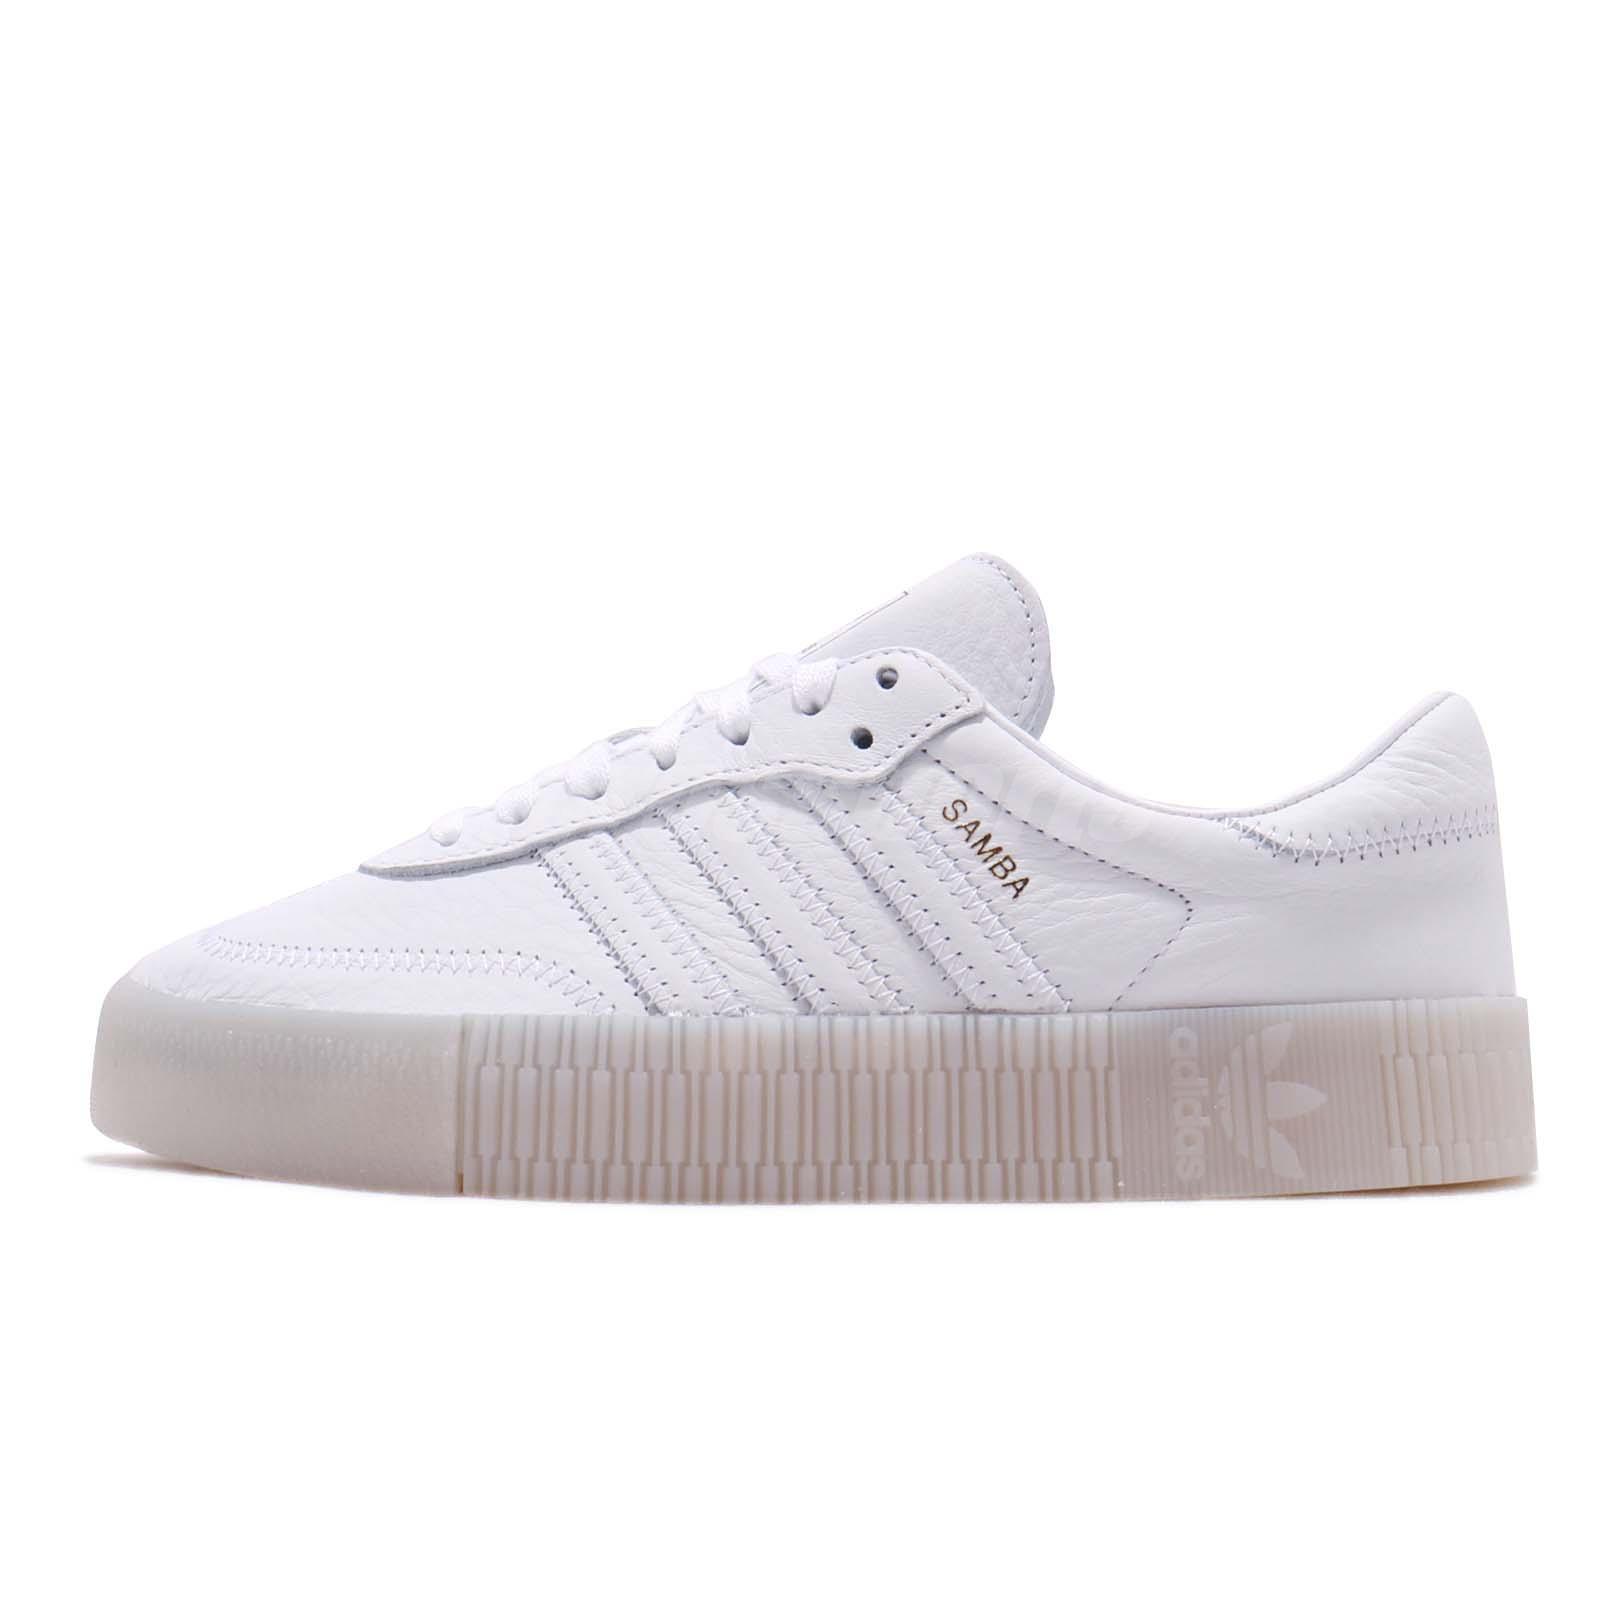 release info on 03572 9d1e8 adidas Originals Sambarose W Platform Two Tone White Women Shoes Sneakers  D96702